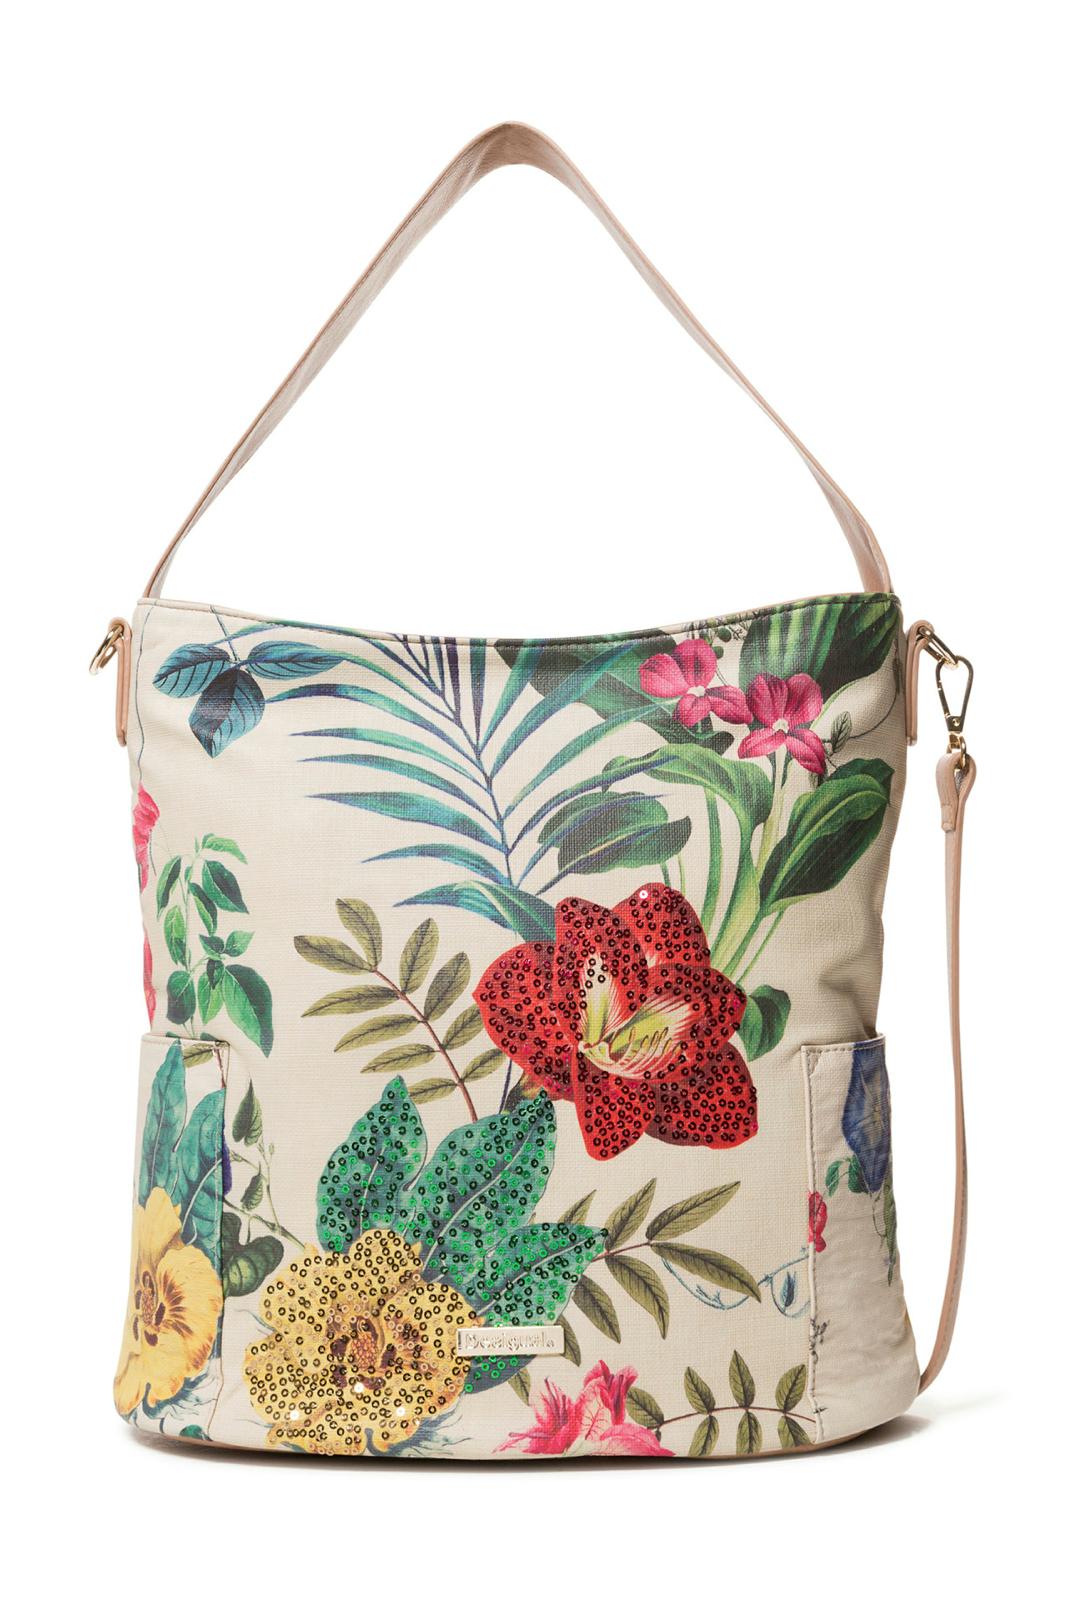 brand new so cheap differently Desigual - Handtasche - Cilo Yakarta Mini